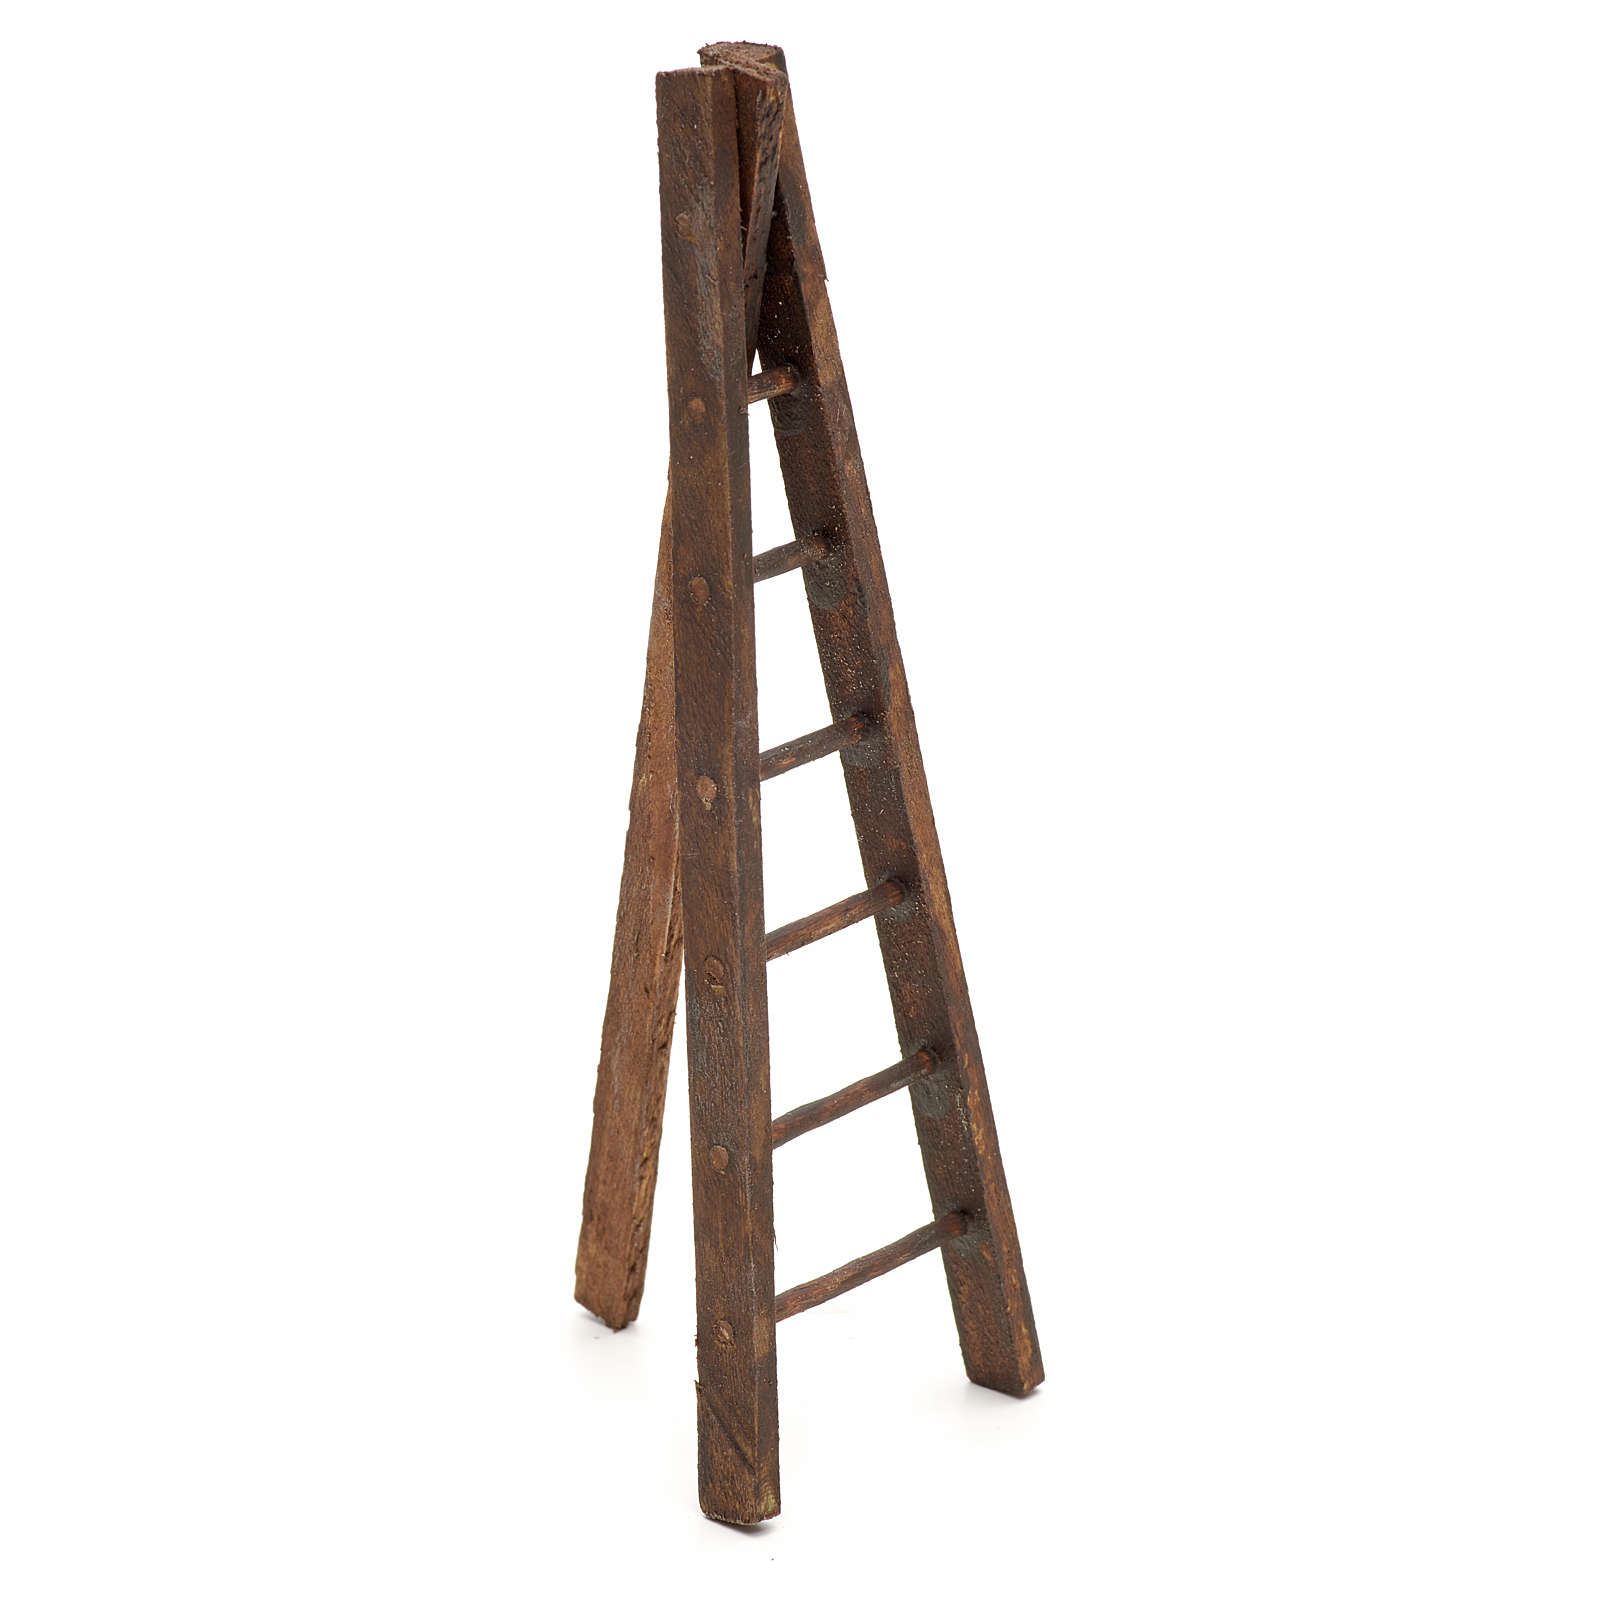 Scala treppiede legno presepe h. 12 4